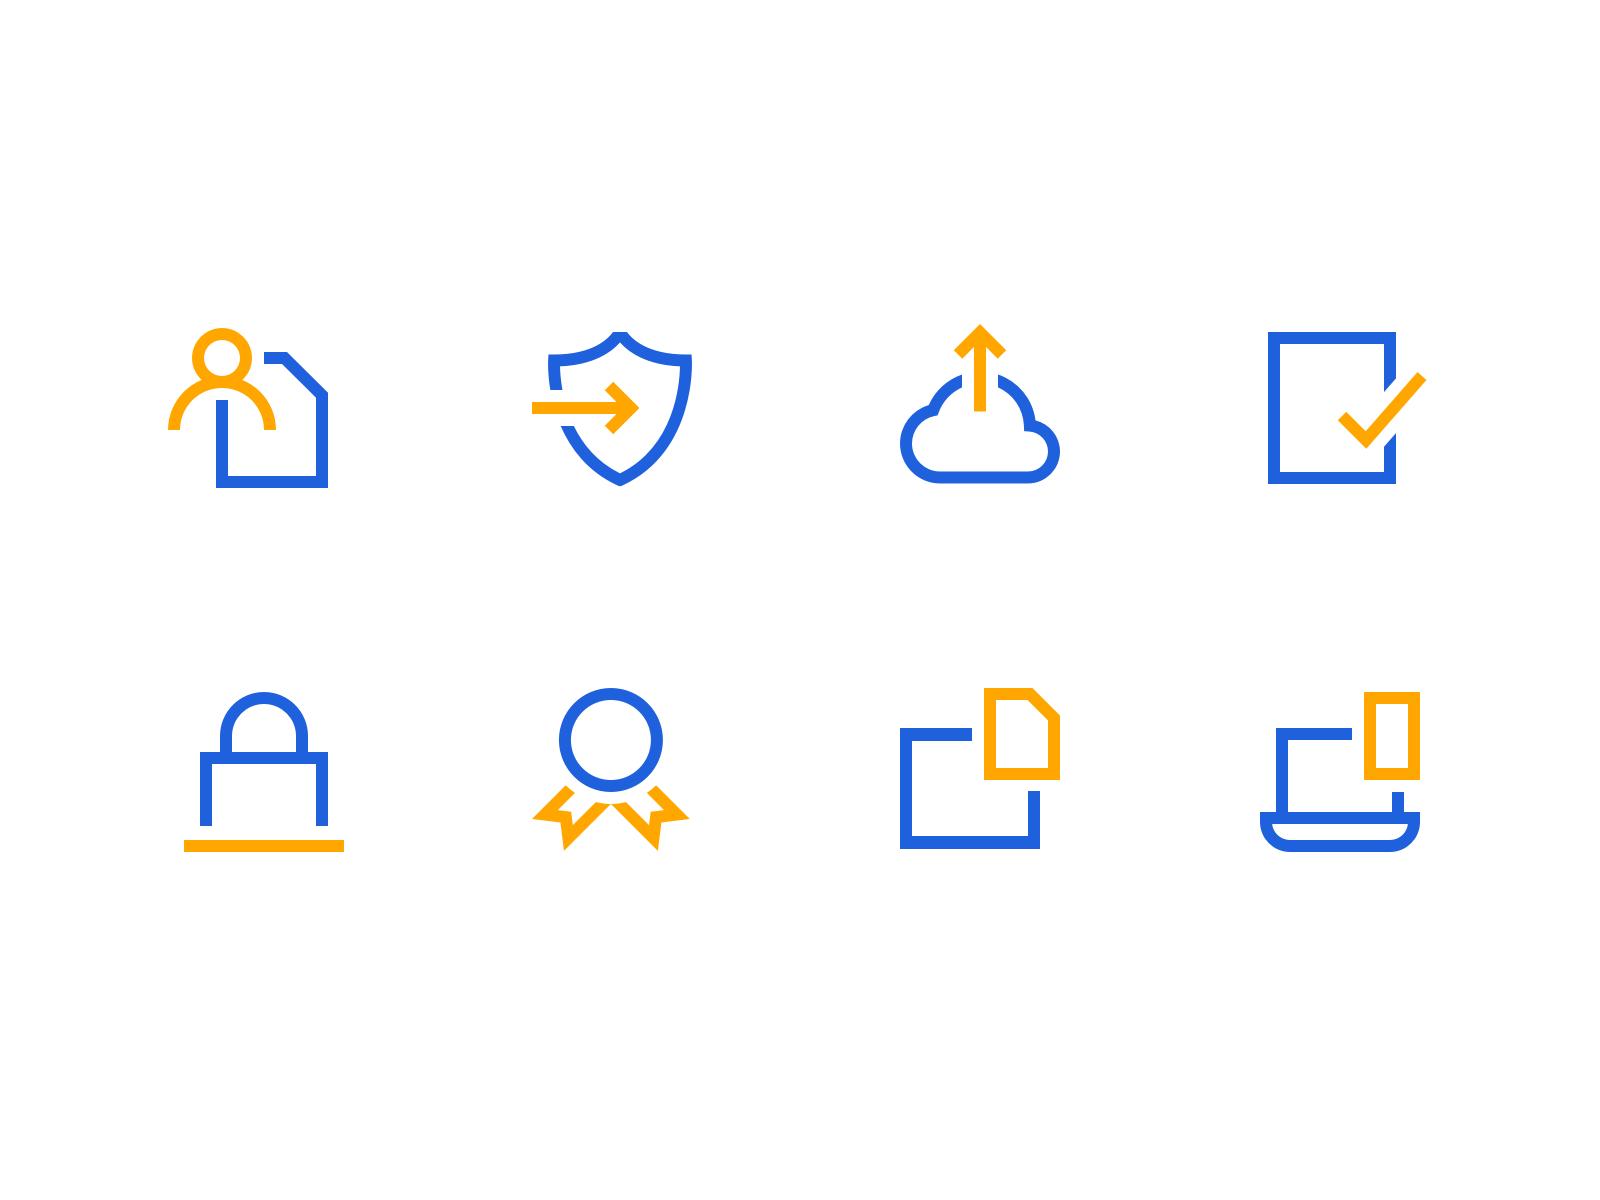 Minimal icon 2x